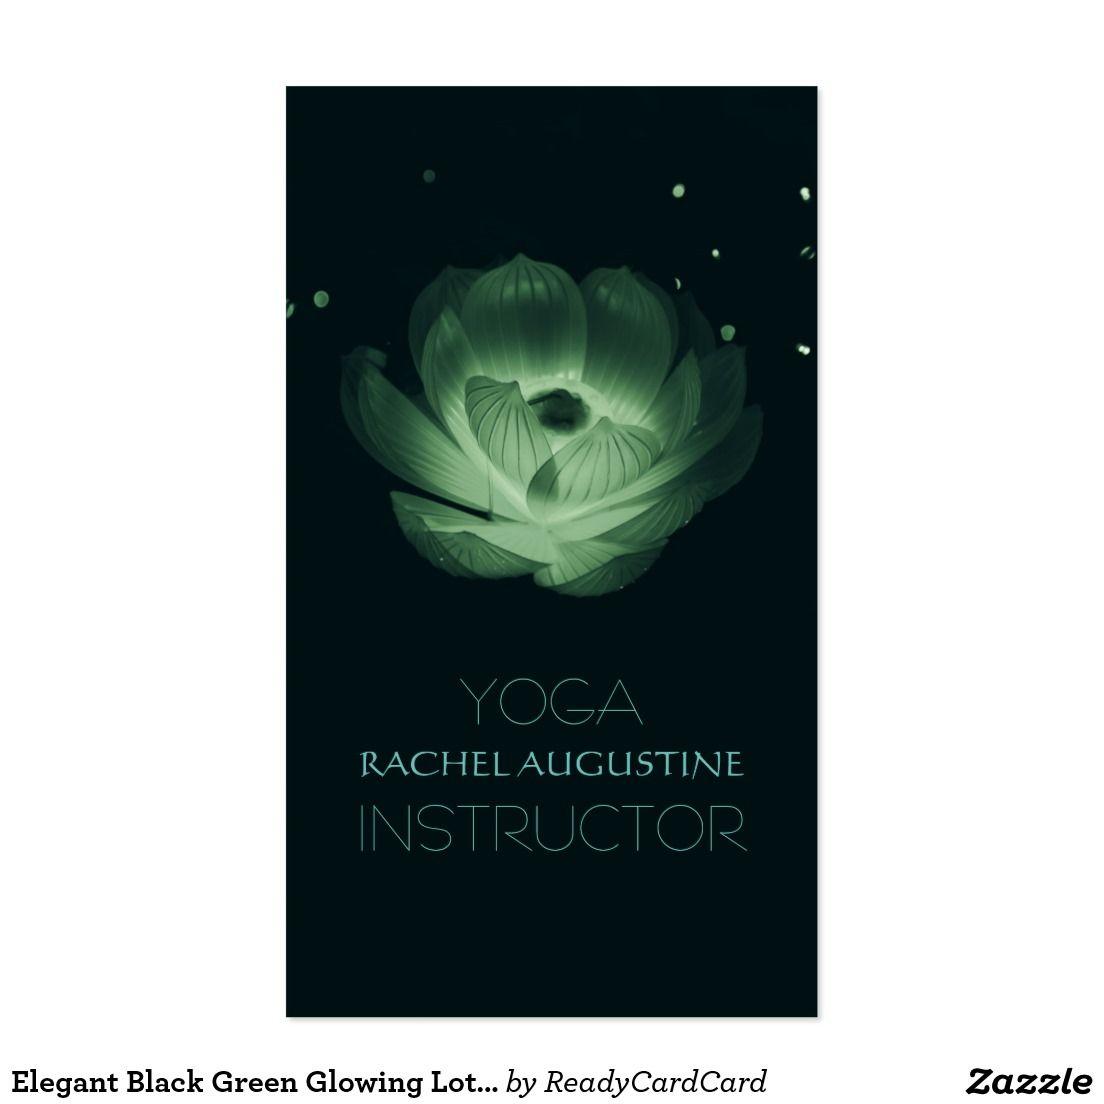 Elegant Black Green Glowing Lotus Yoga Instructor Business Card